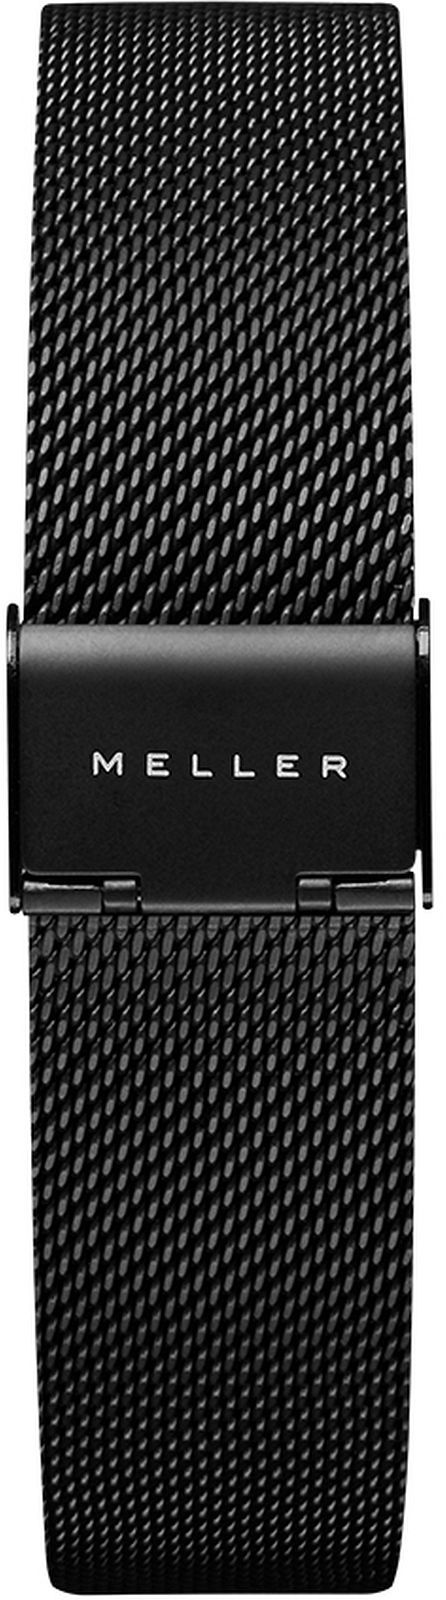 Bransoleta Meller Black Metal 20 mm